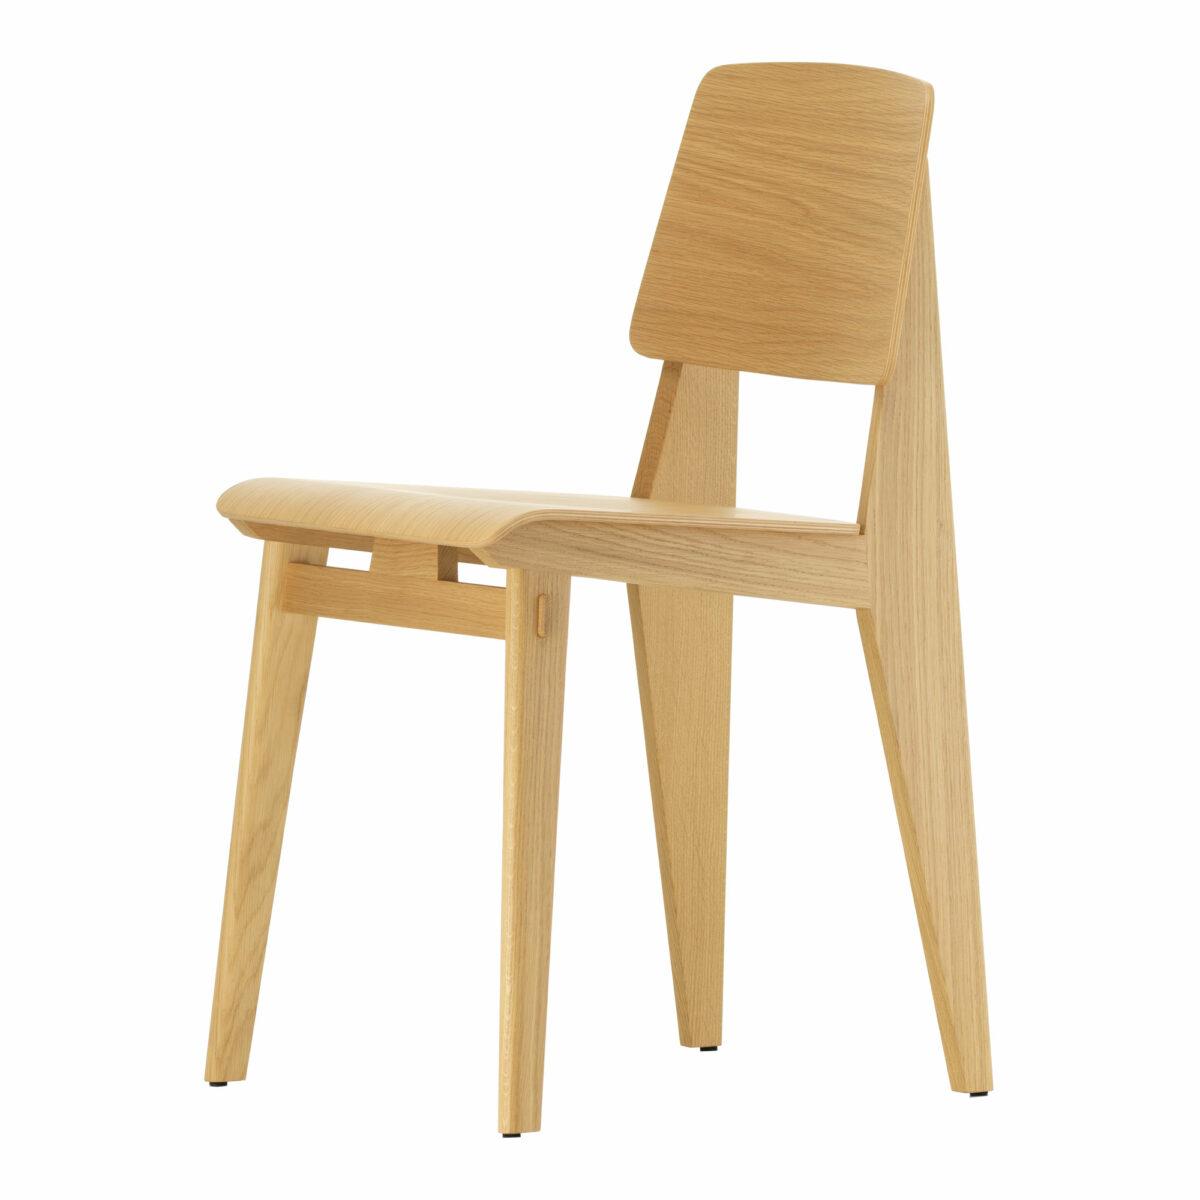 vitra chaise tout bois natural oak